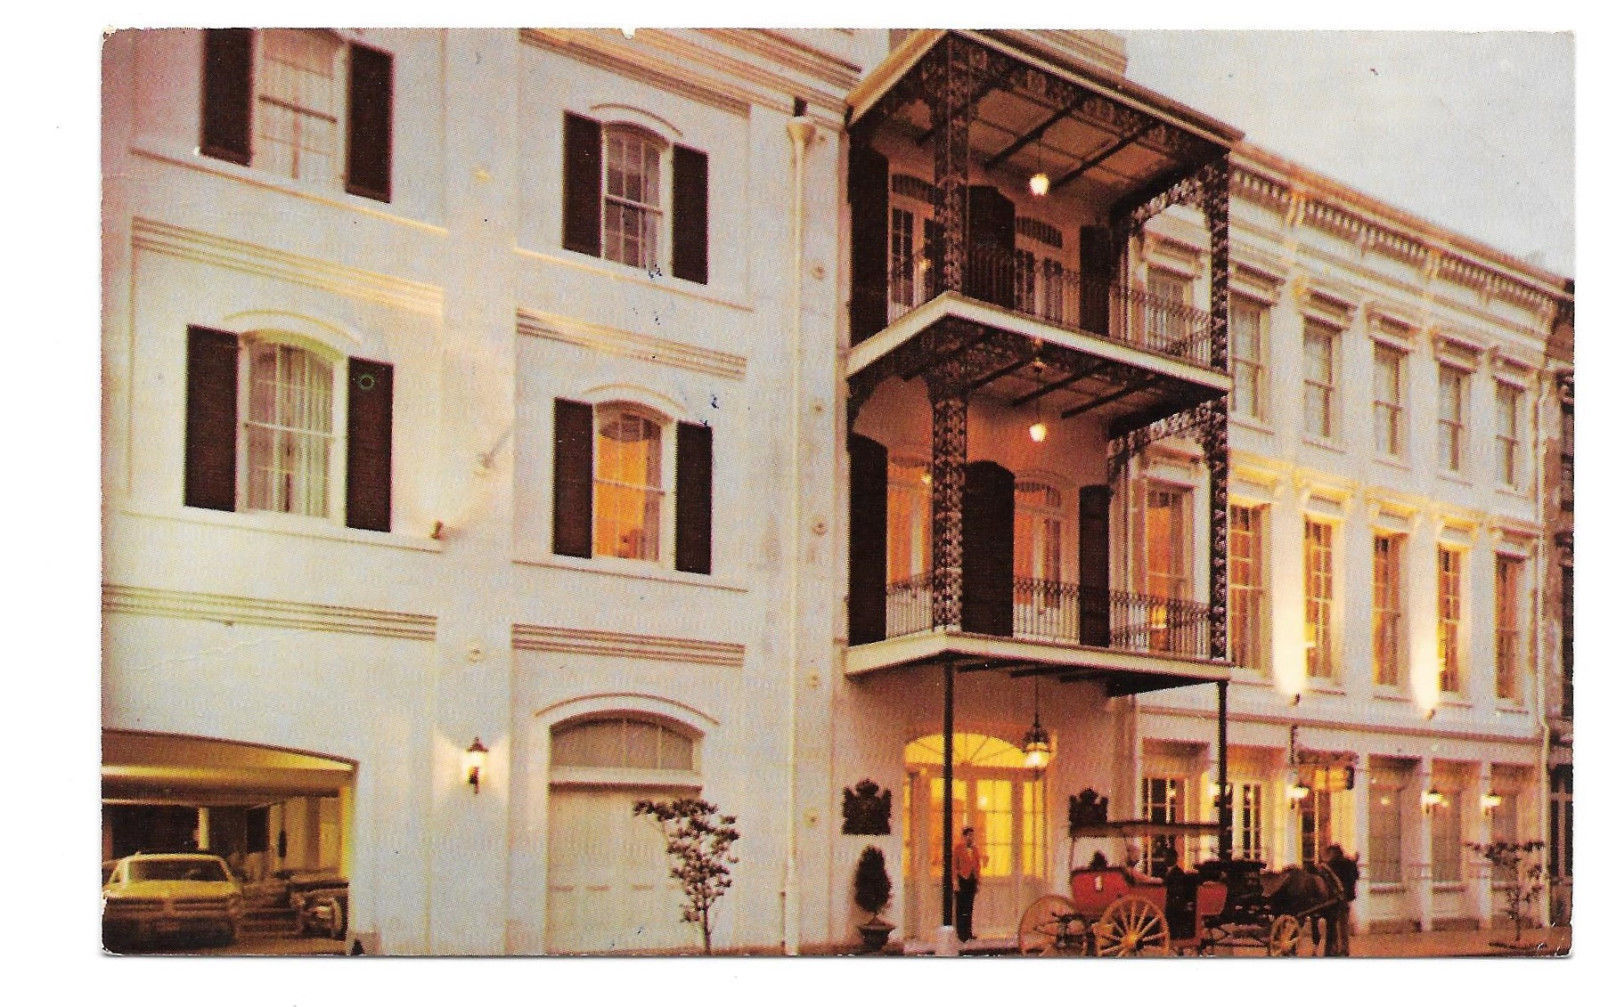 New Orleans Bienville House Motor Hotel Motel Decatur Street Vtg 1973 Postcard